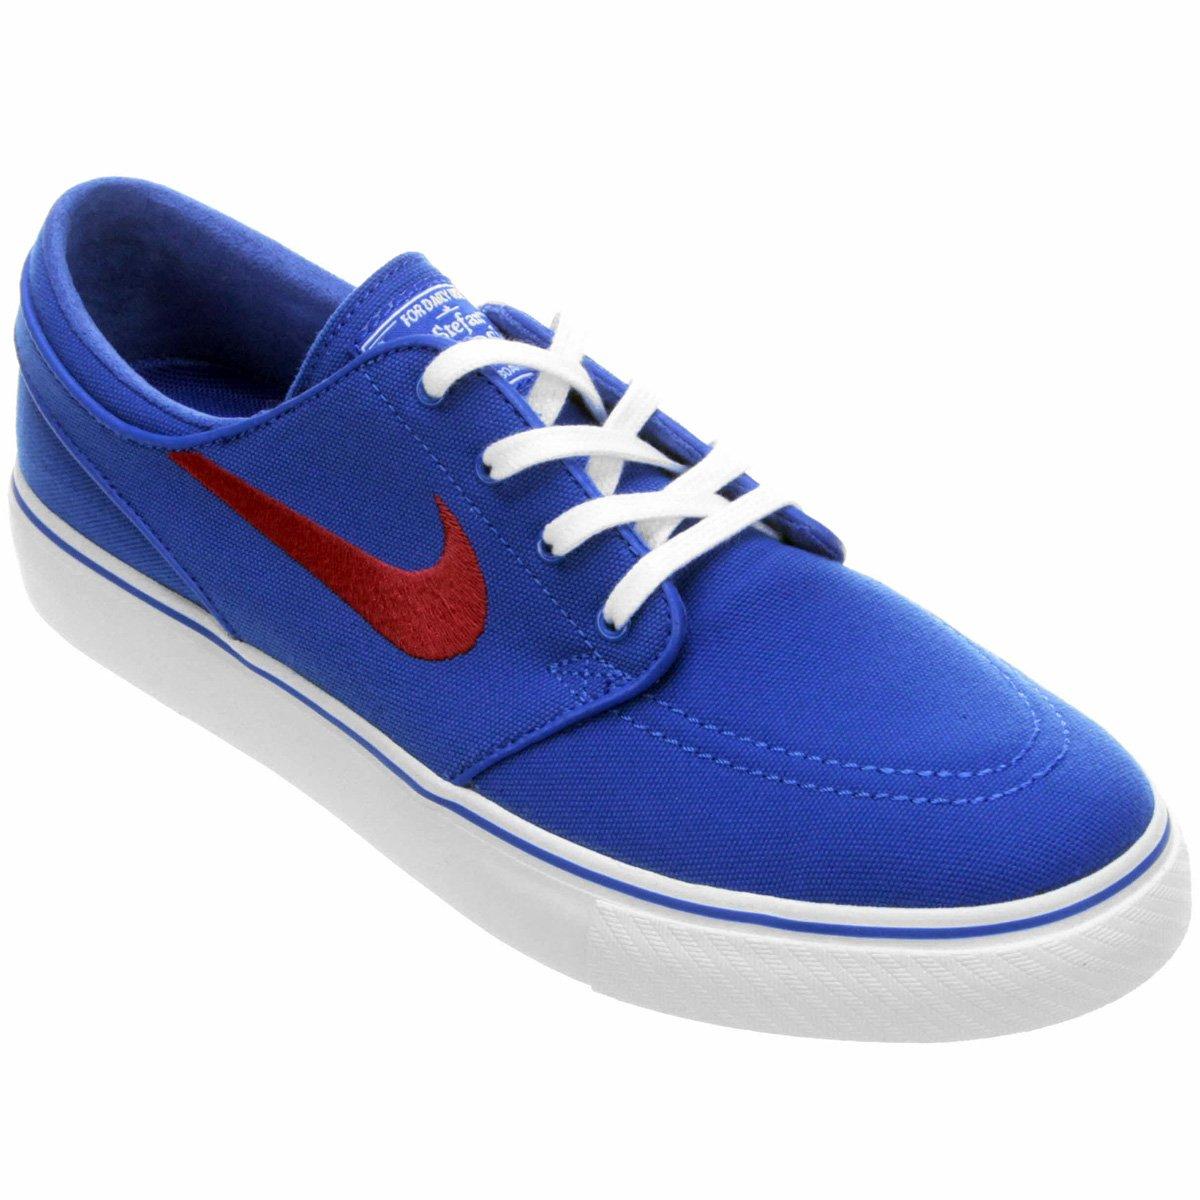 wholesale dealer 21b9d 84652 Tênis Nike Zoom Stefan Janoski Canvas - Compre Agora  Netsho